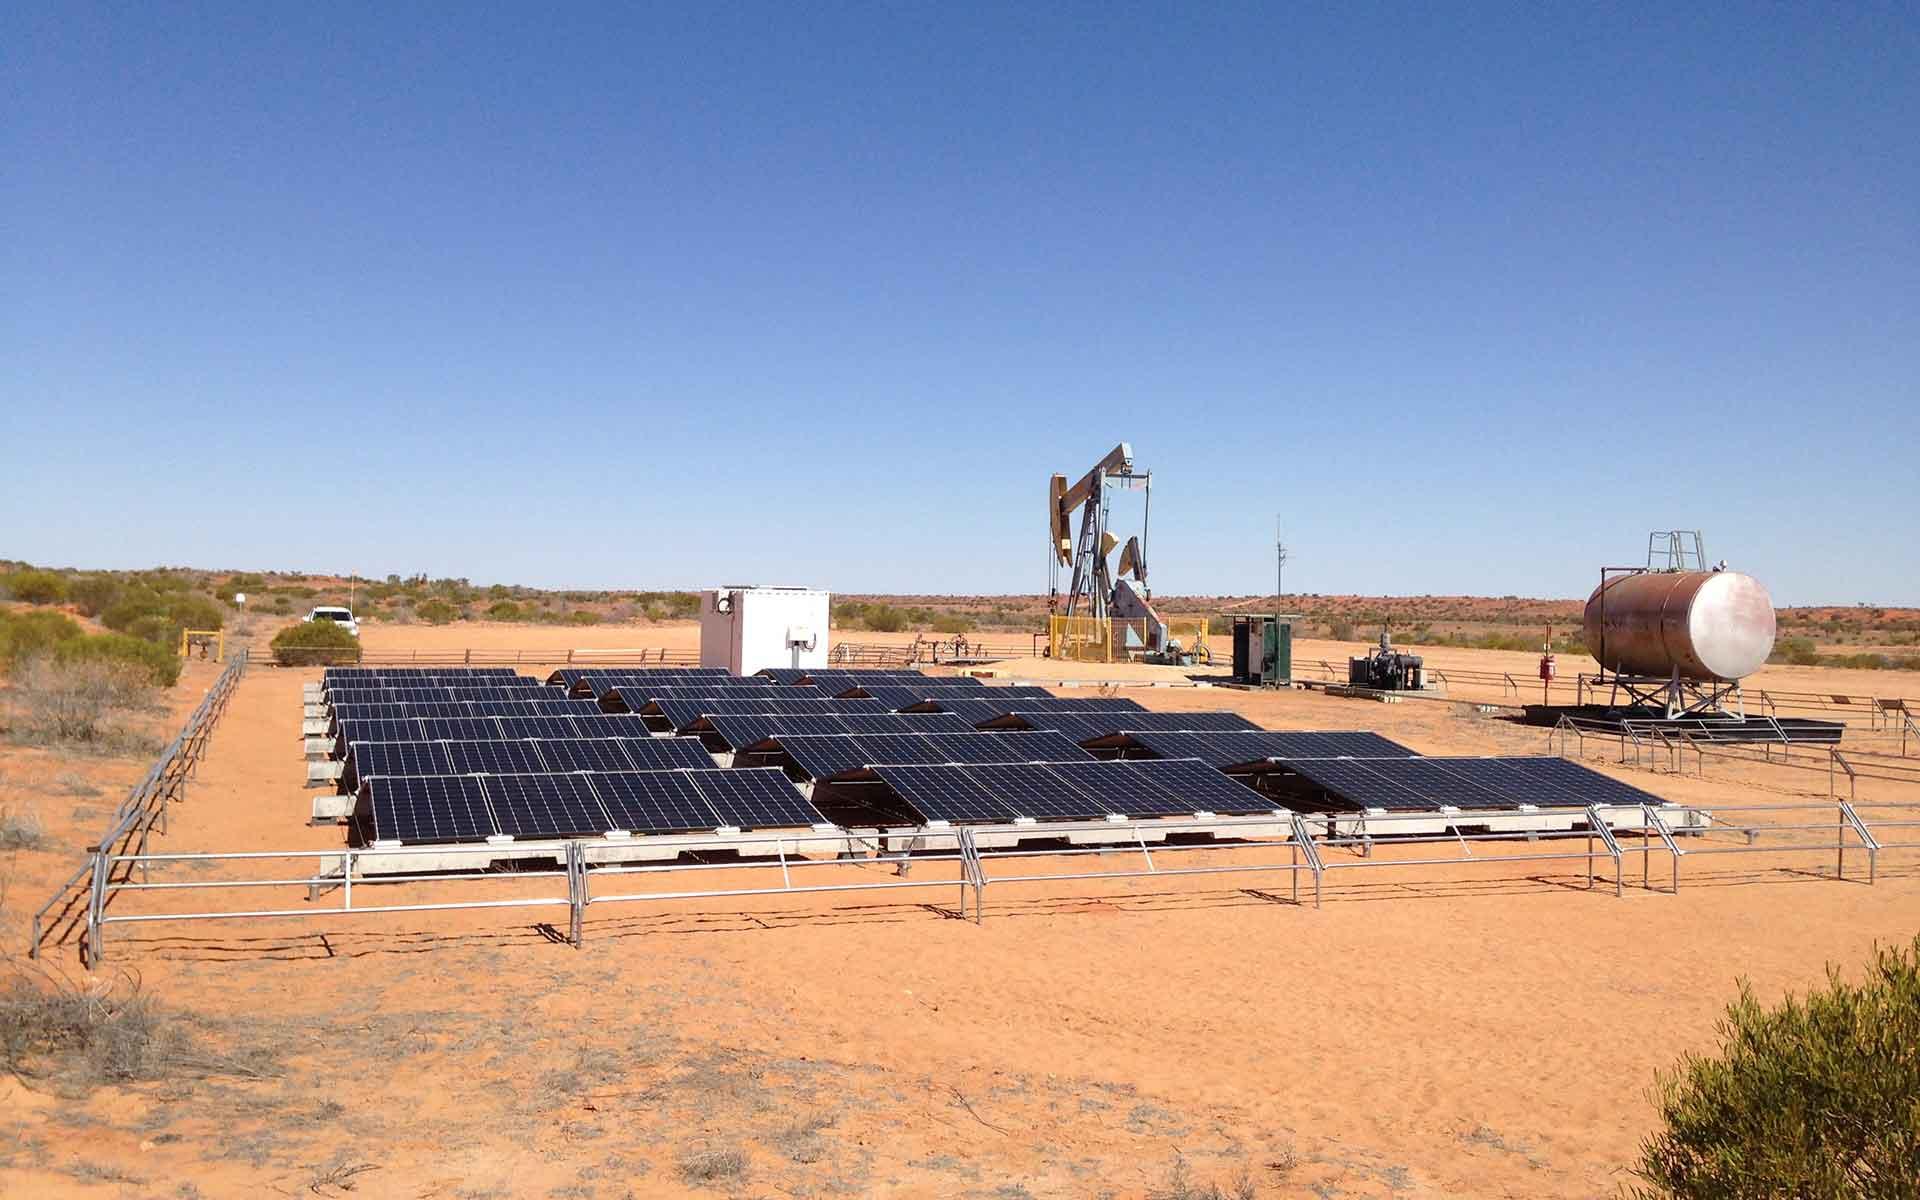 Image - The pilot solar powered pump